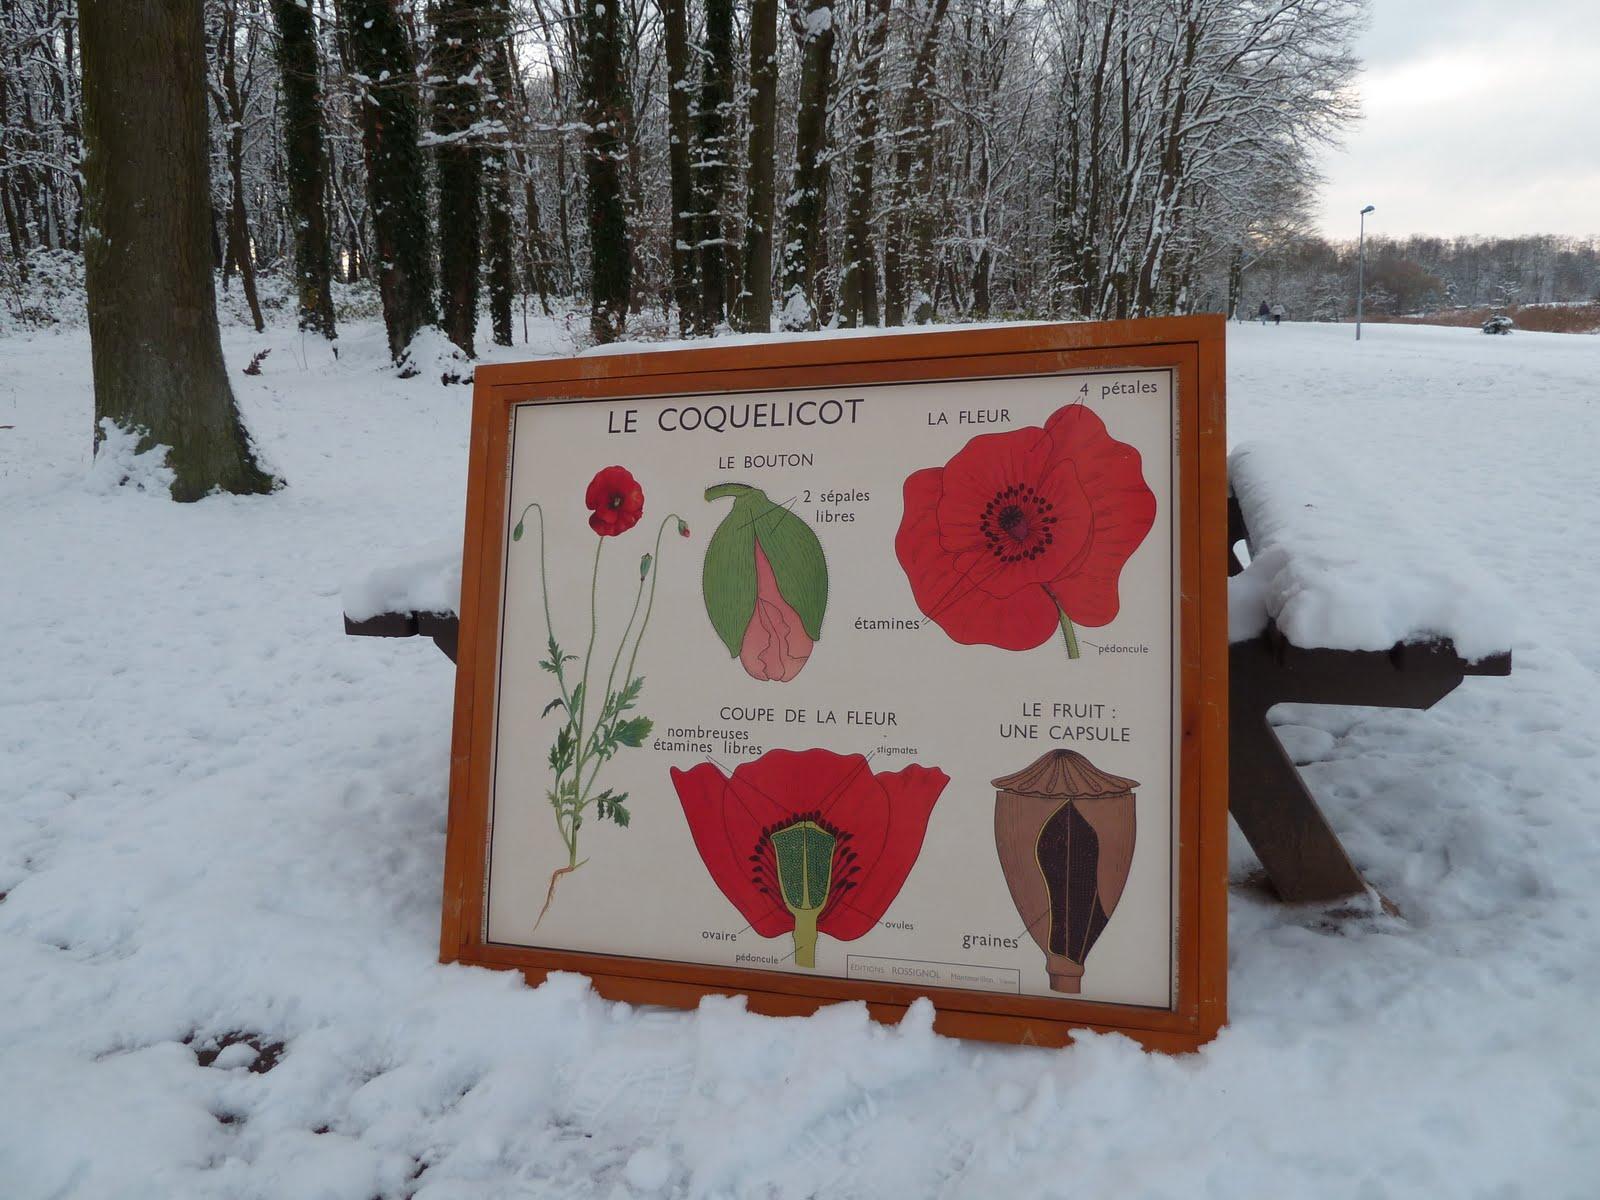 ecole fmr 1000 affiches scolaires le coquelicot ancienne affiche scolaire rossignol plante. Black Bedroom Furniture Sets. Home Design Ideas